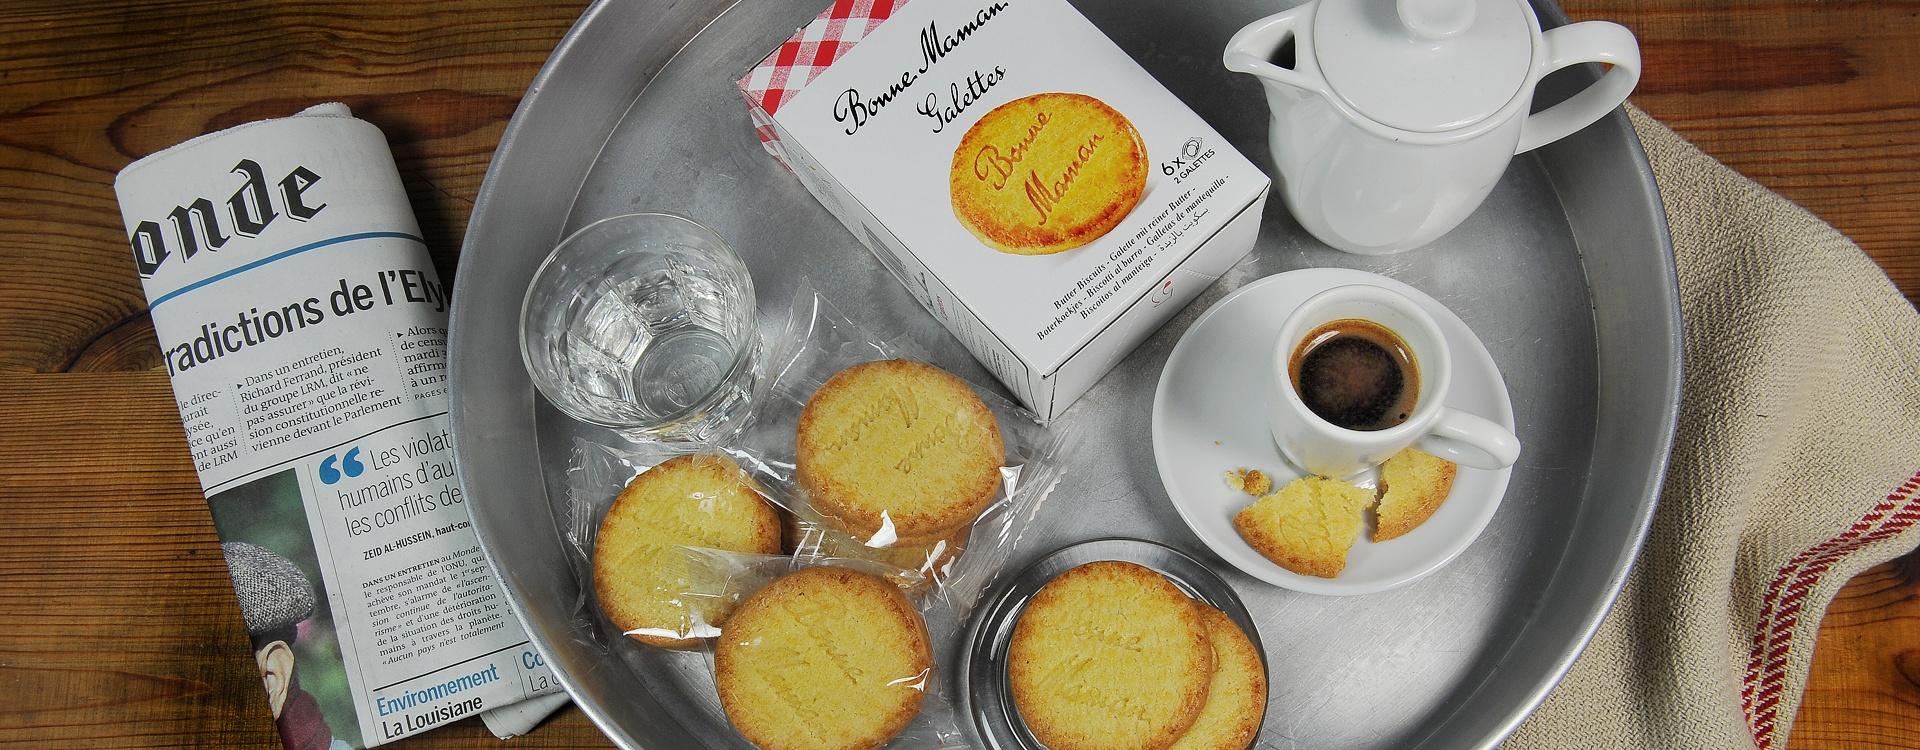 Top Food Feinkost - Bonne Maman Galettes